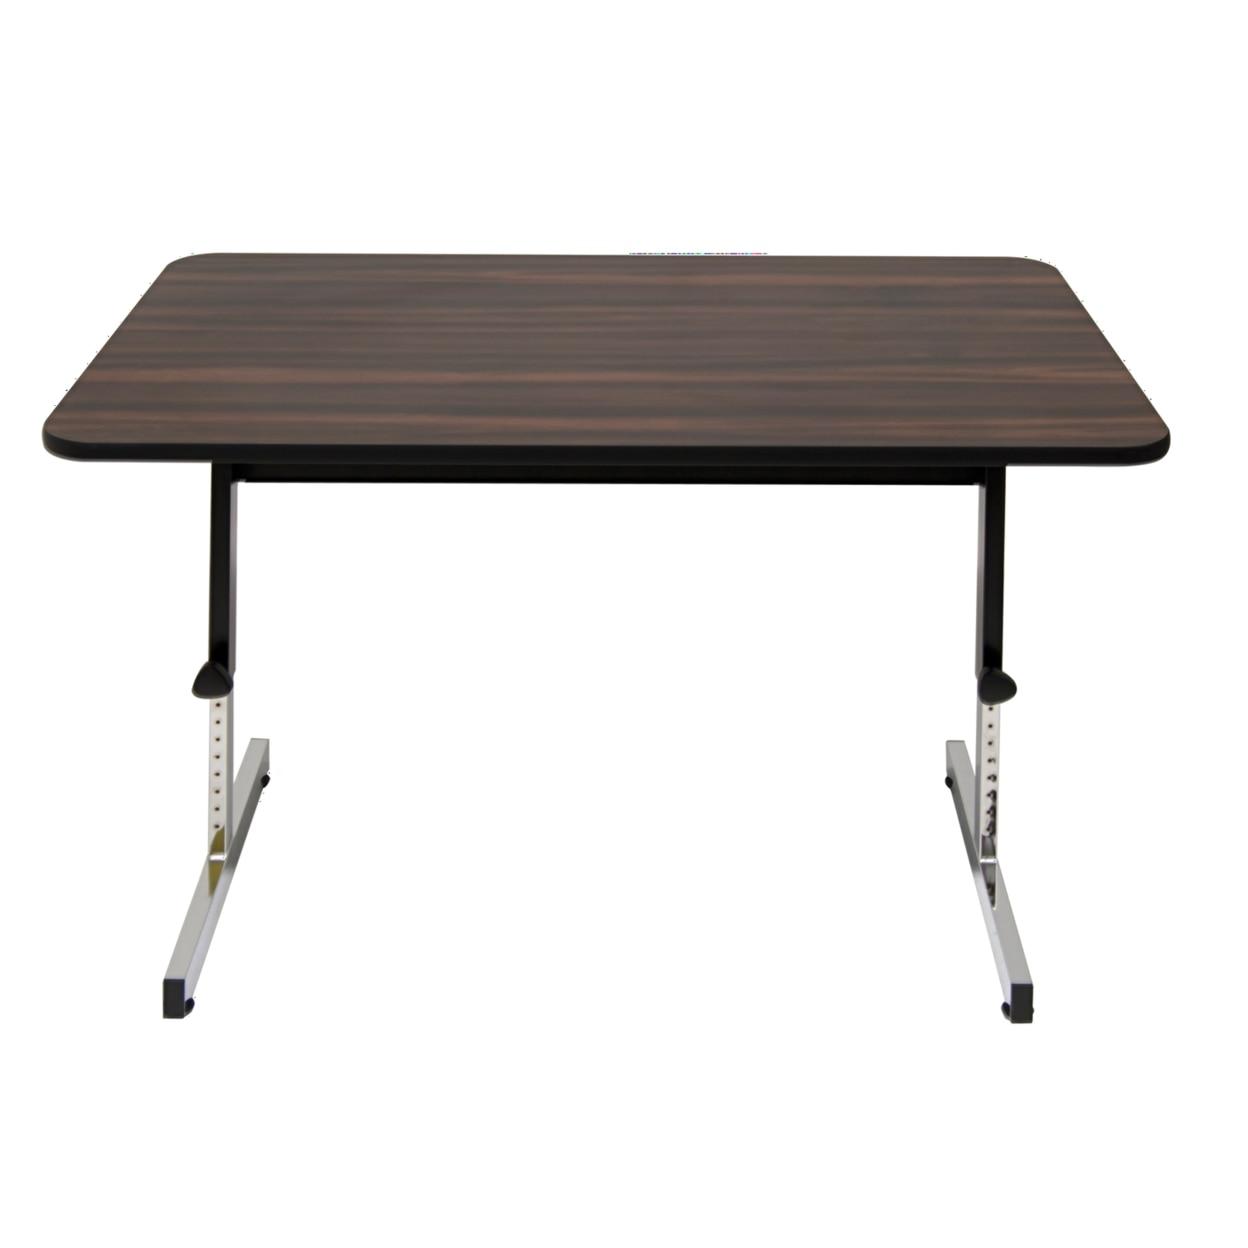 Studio Designs Home Office Adapta Desk 48 Desk - Black/Walnut studio designs home office maxima ii drafting chair black